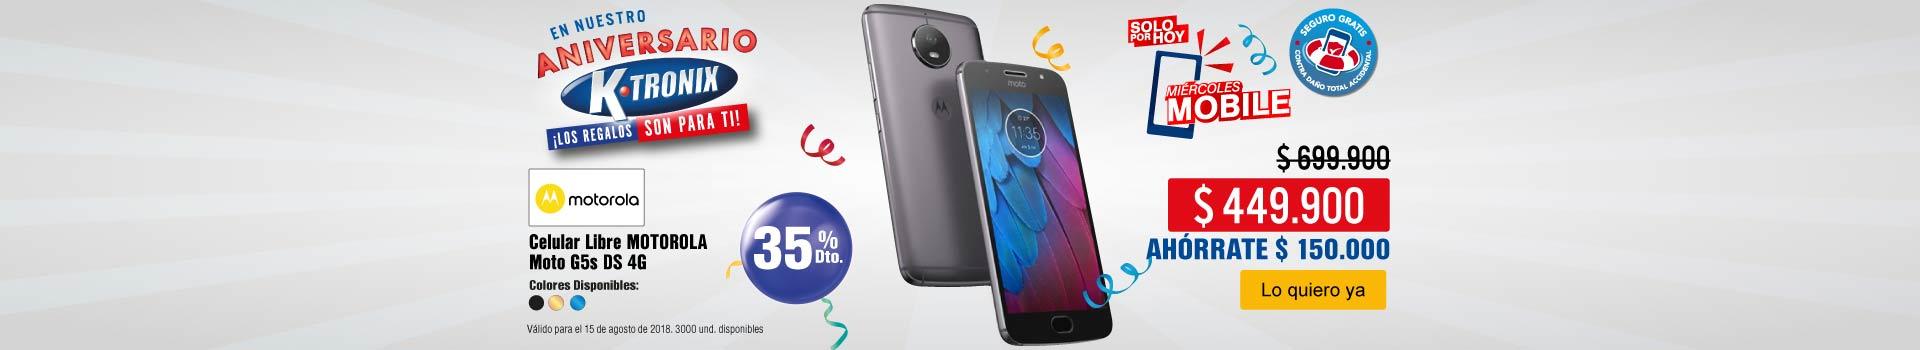 KT-BCAT-1-celulares-PP---Miercolesmobile-Motorola-MotoG5s-Ago15